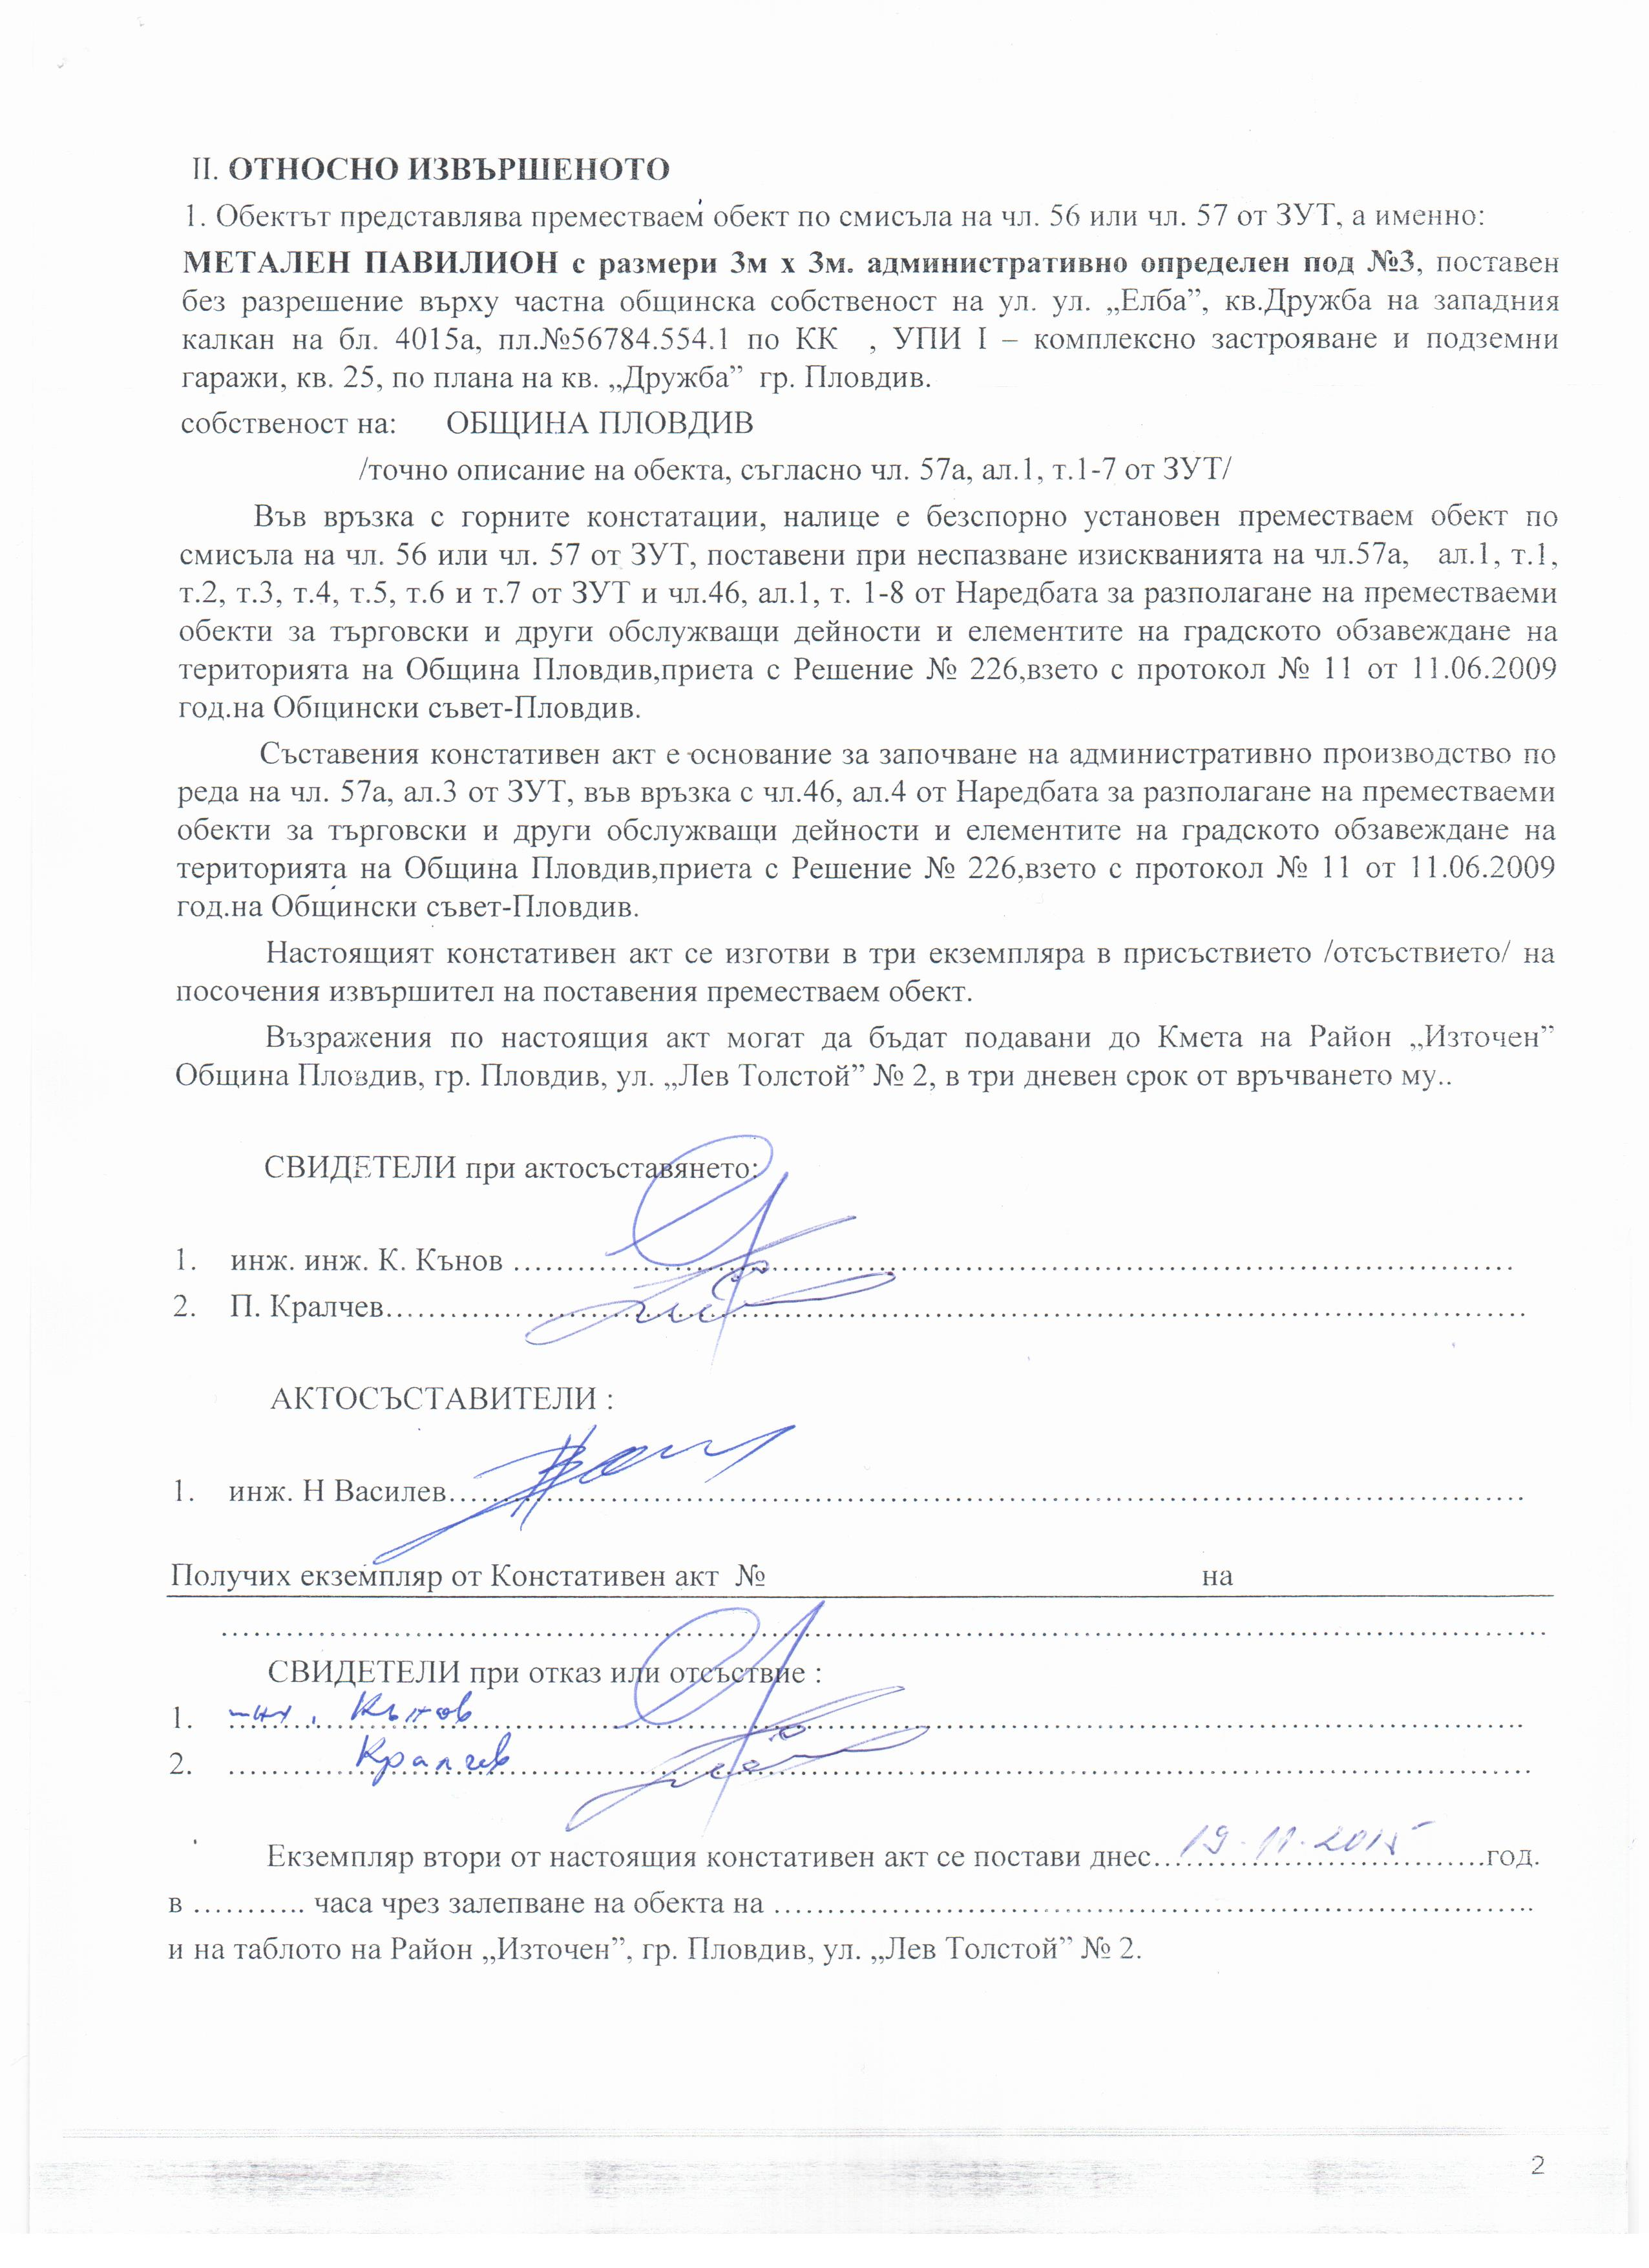 KONSTATIVEN_AKT_№78 (1)